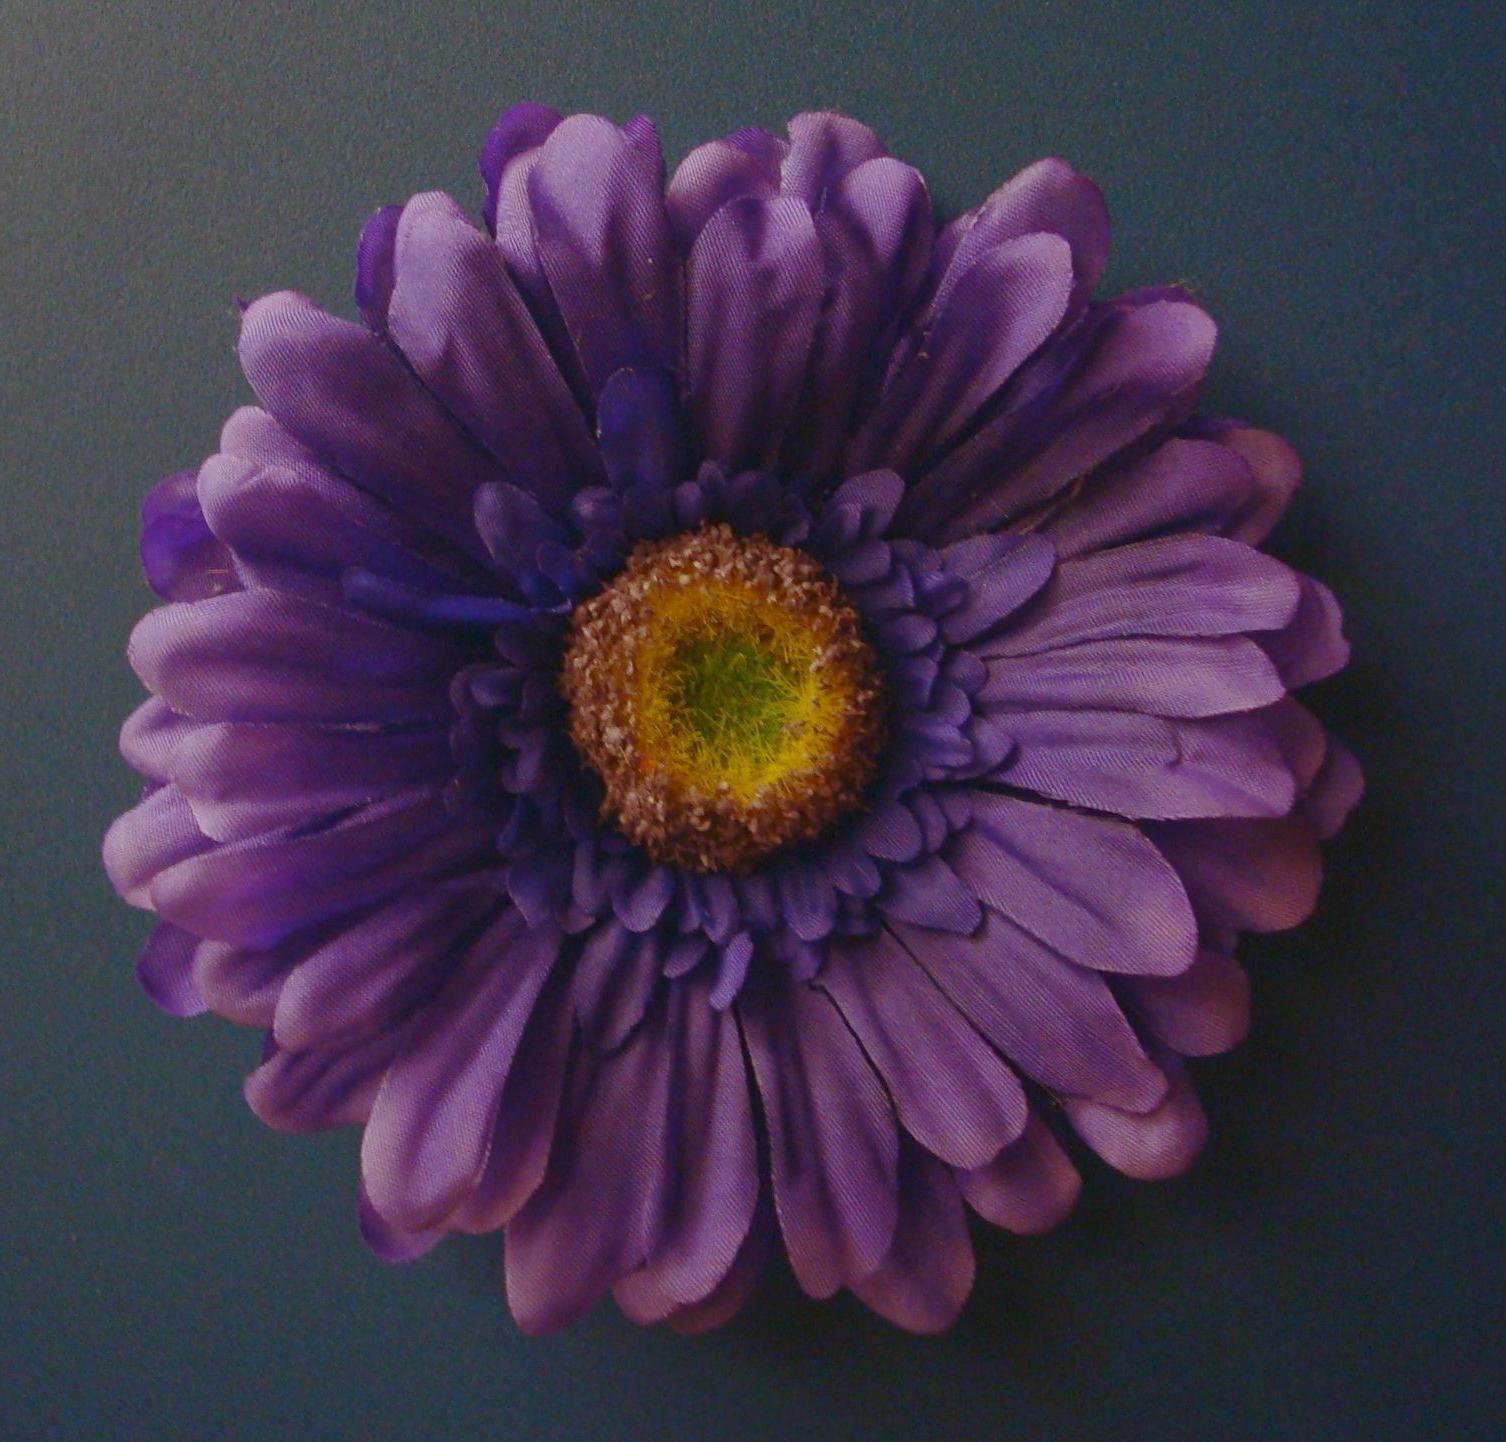 This festive Gerbera daisy